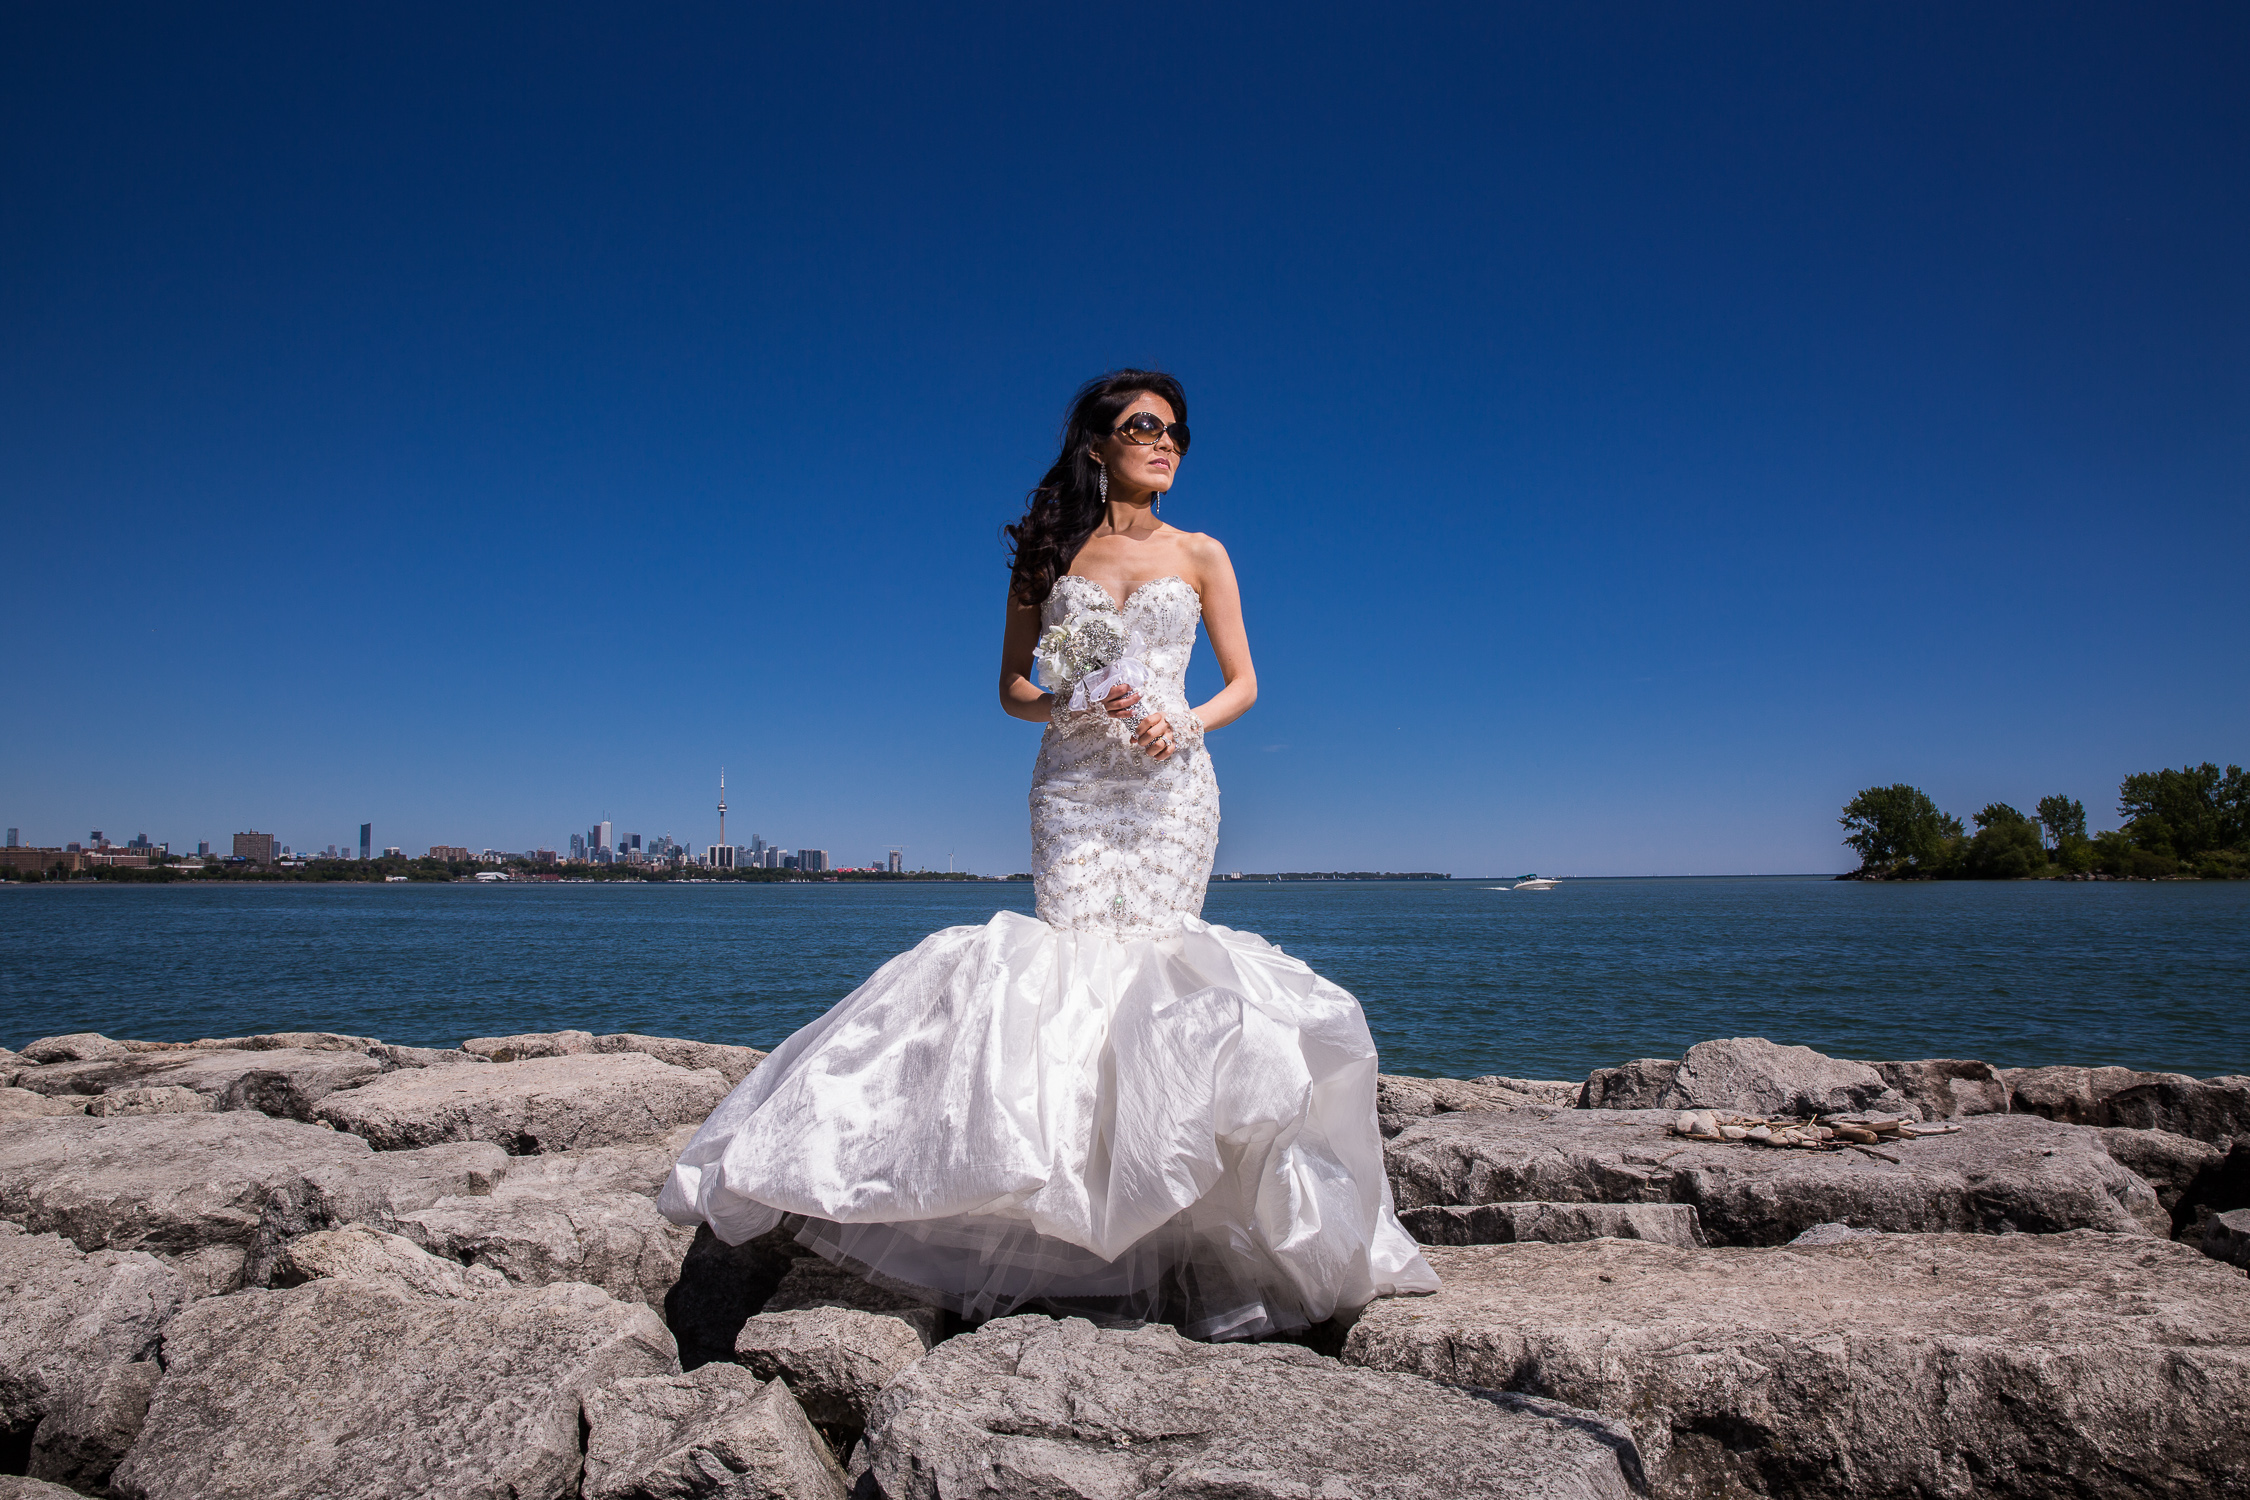 Paradise-Banquet-Hall-Wedding-Vaughan-Ontario-0056.jpg